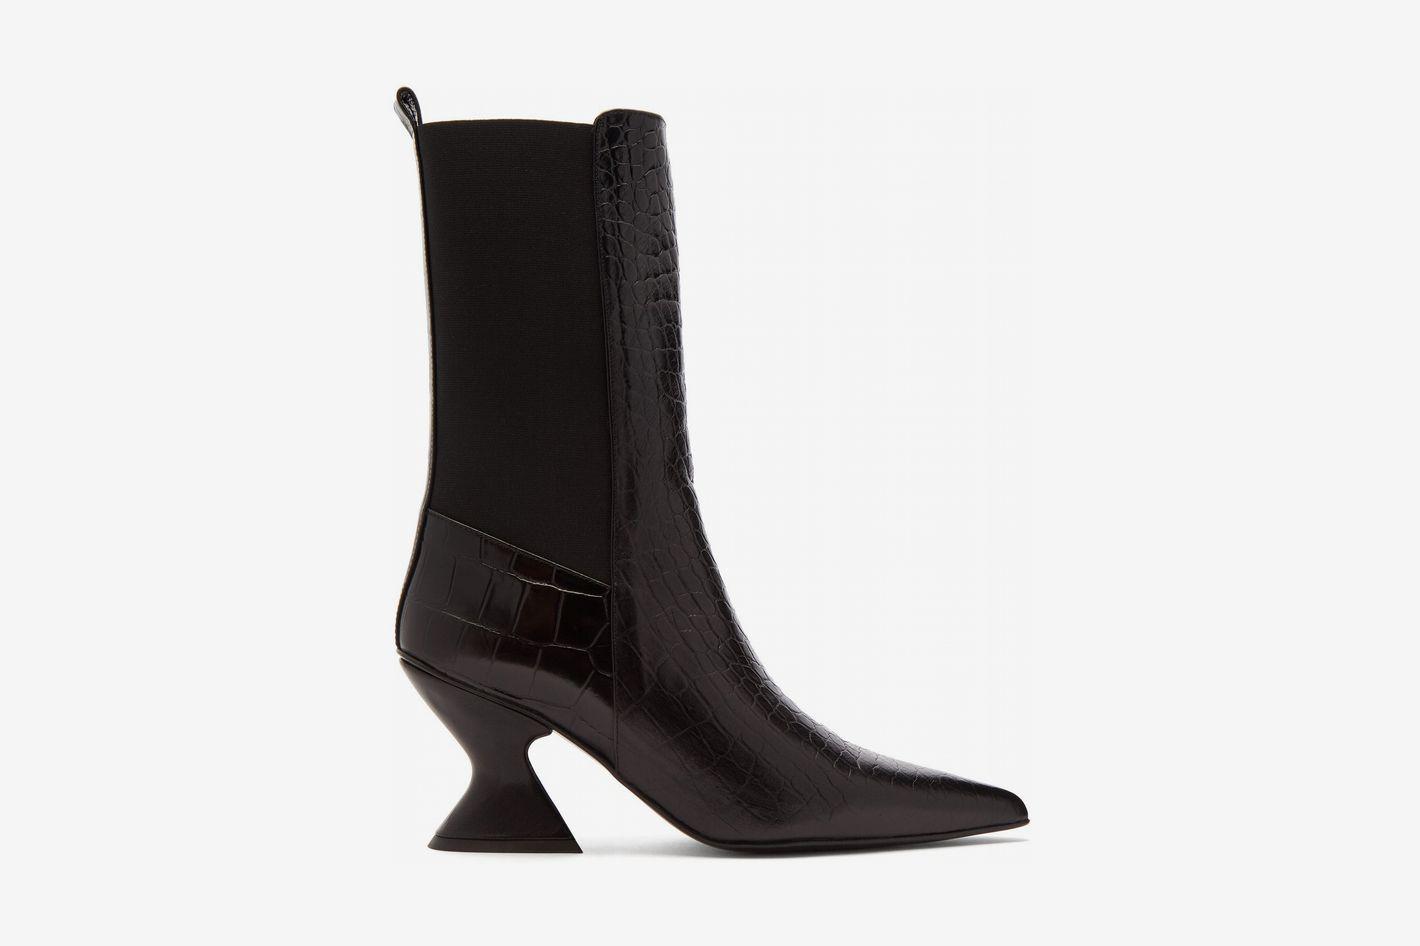 Marques'Almeida Hourglass-Heel Leather Chelsea Boots